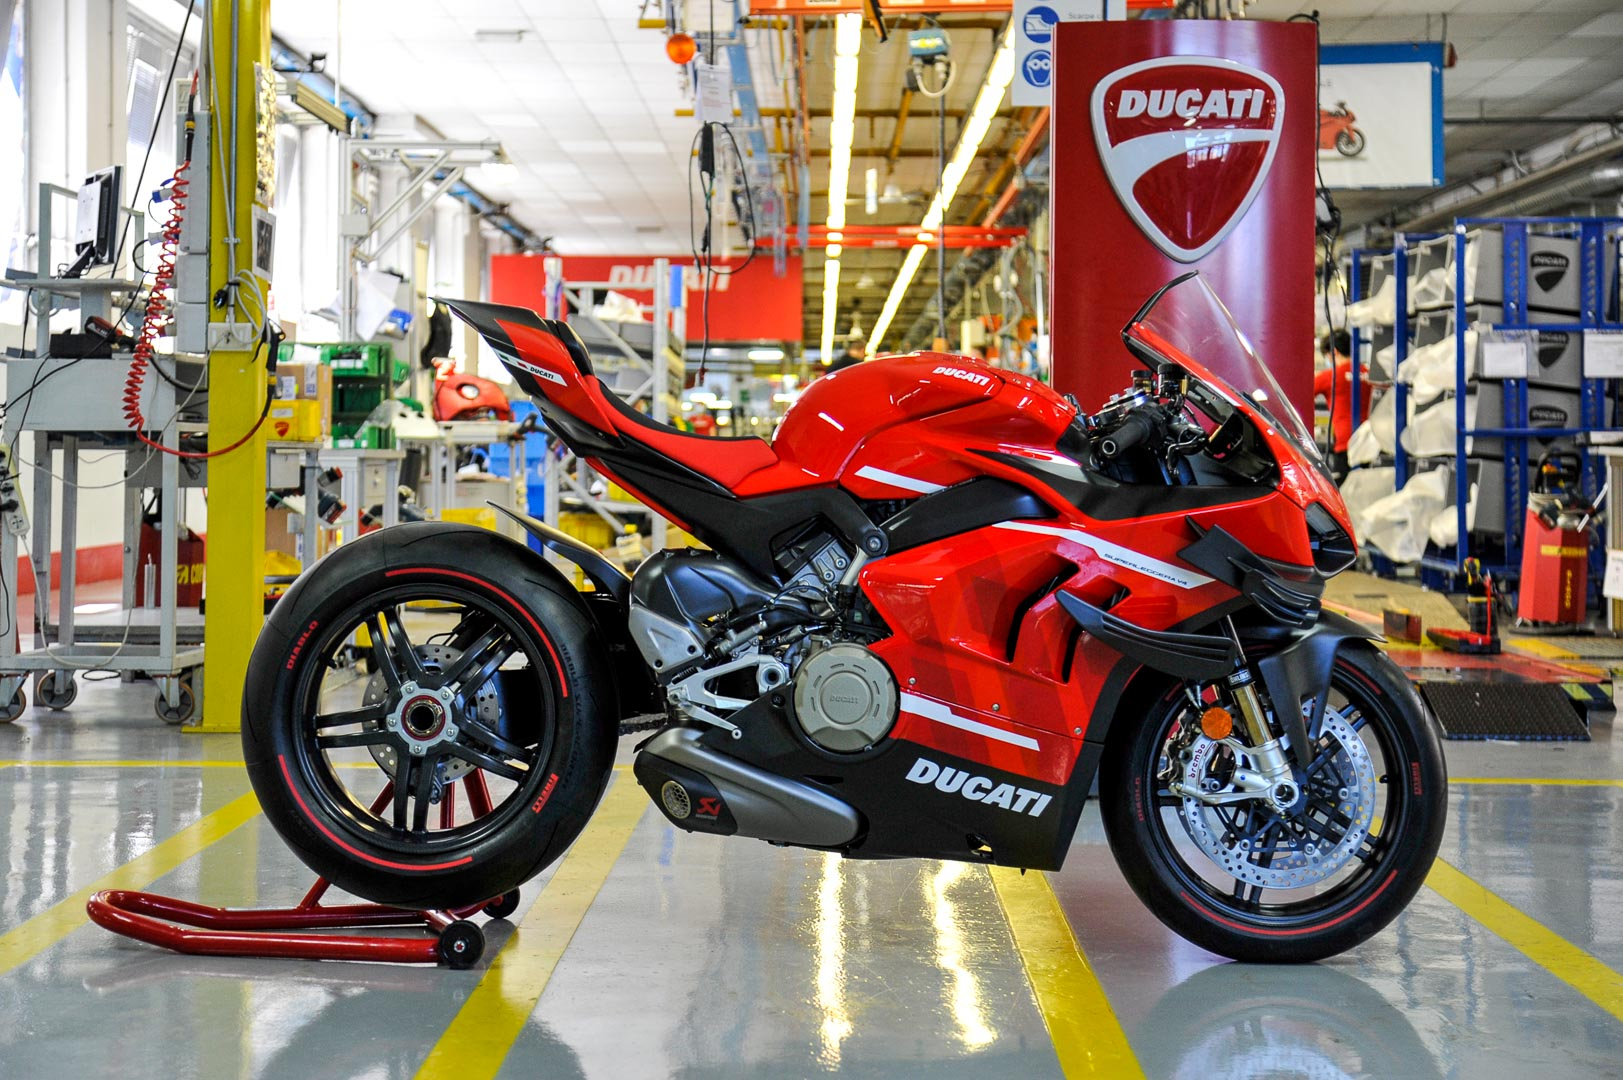 2020 Ducati Superleggera V4 Production Begins: Photos and Video